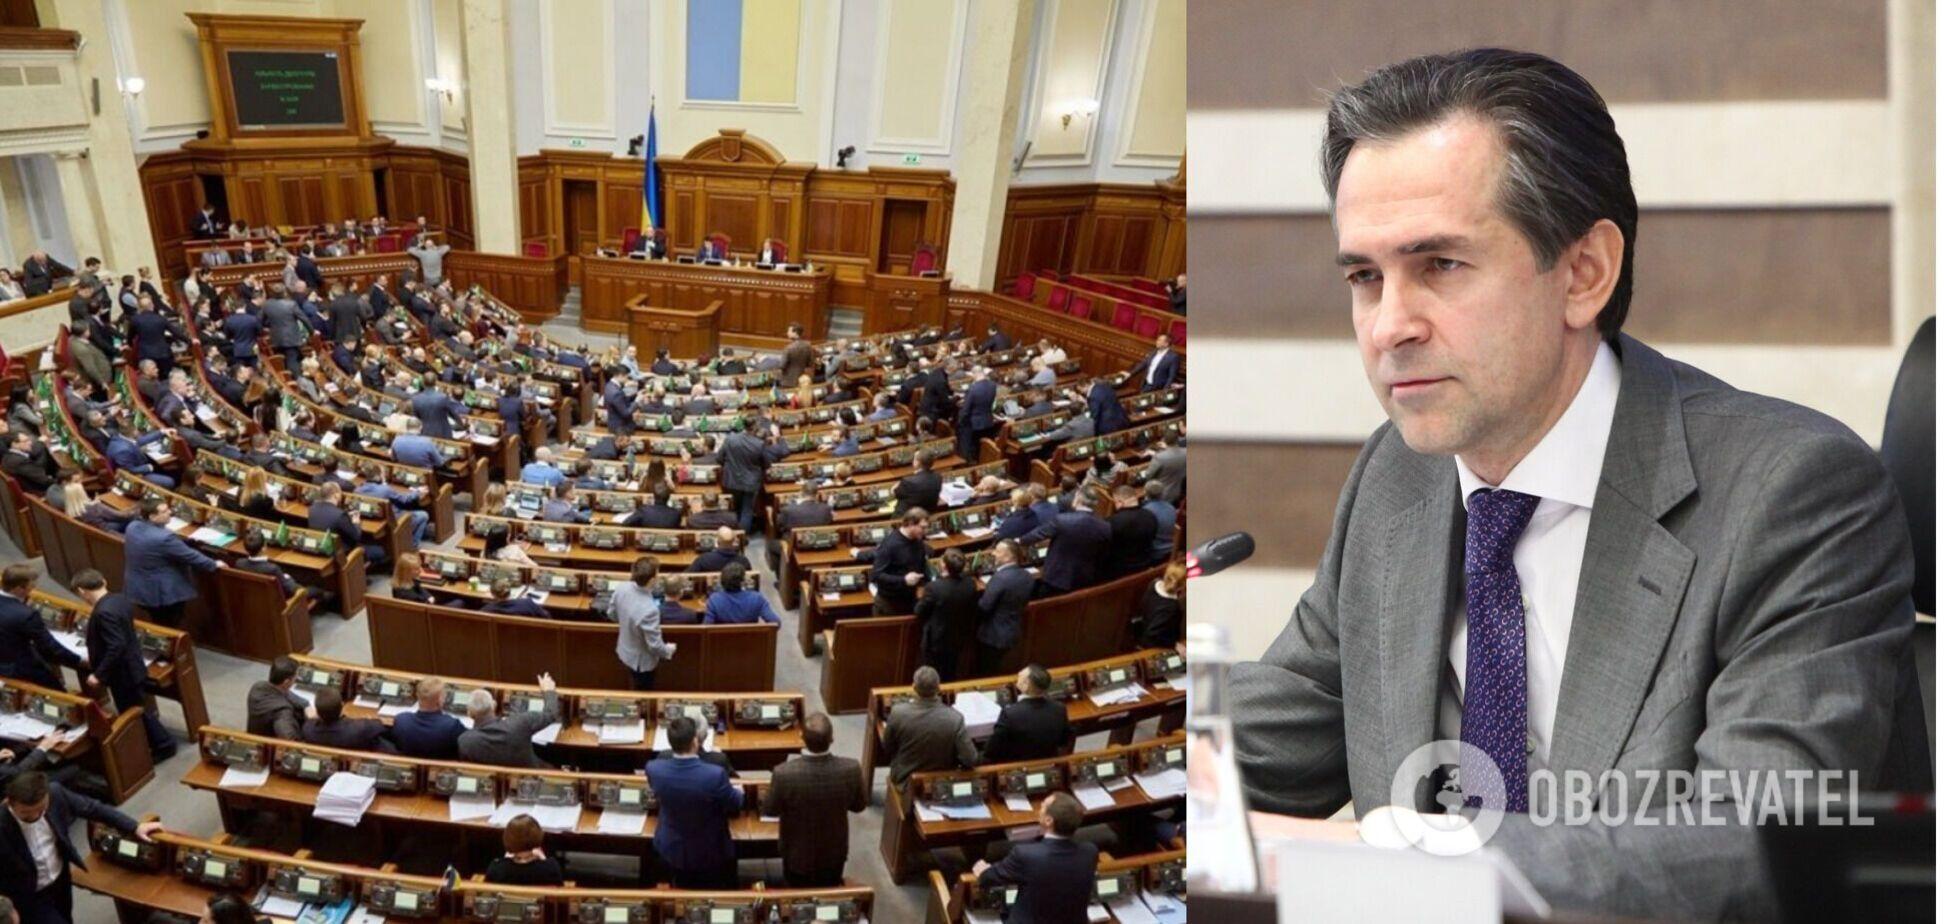 Комитет ВР принял решение по кандидатуре Любченко на пост министра экономики